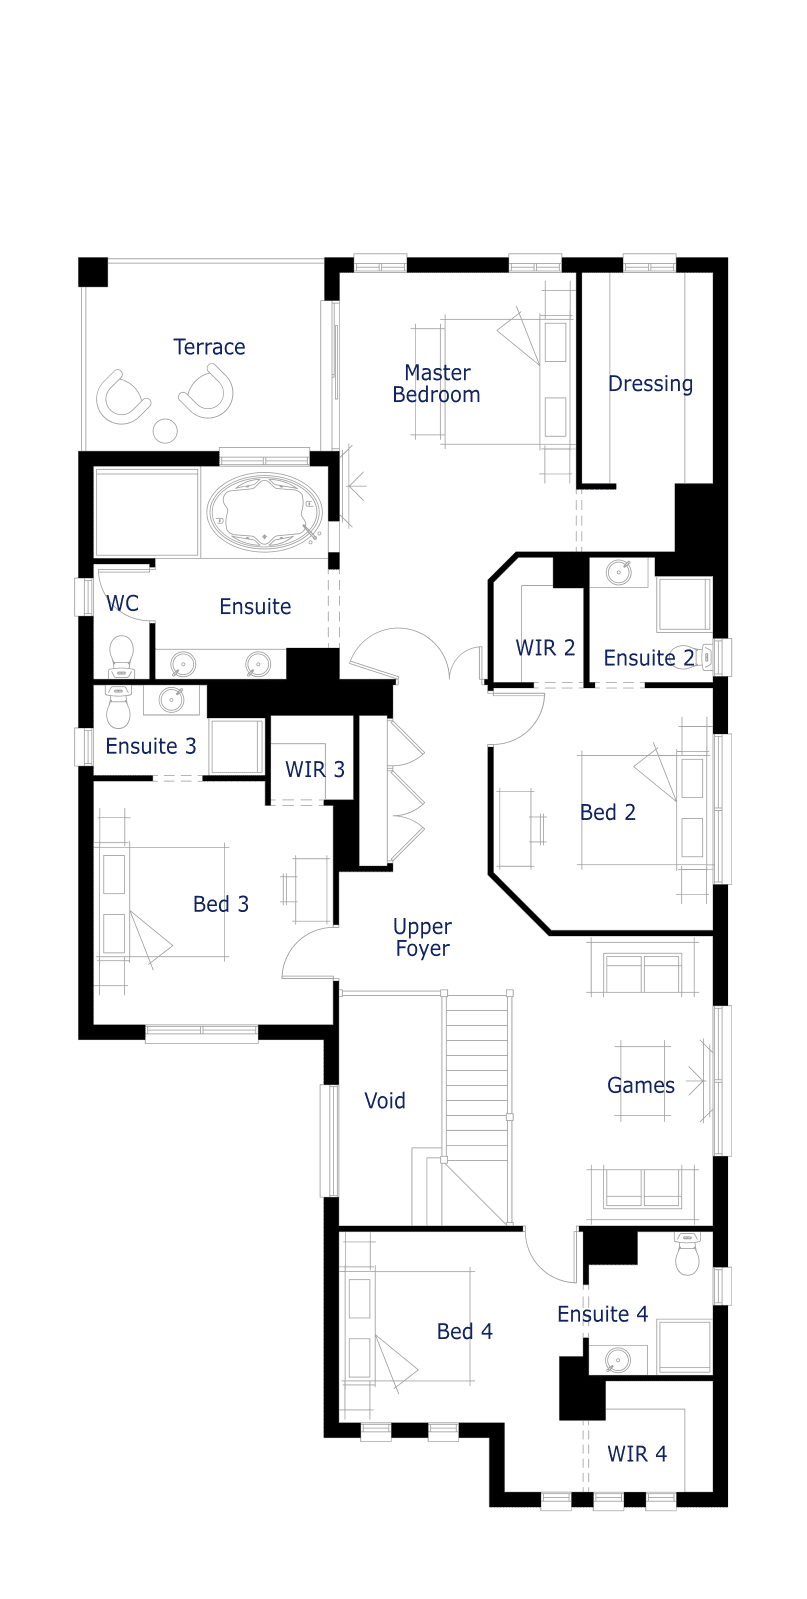 FloorPlan2_HOUSE653_Plaza_44L-02